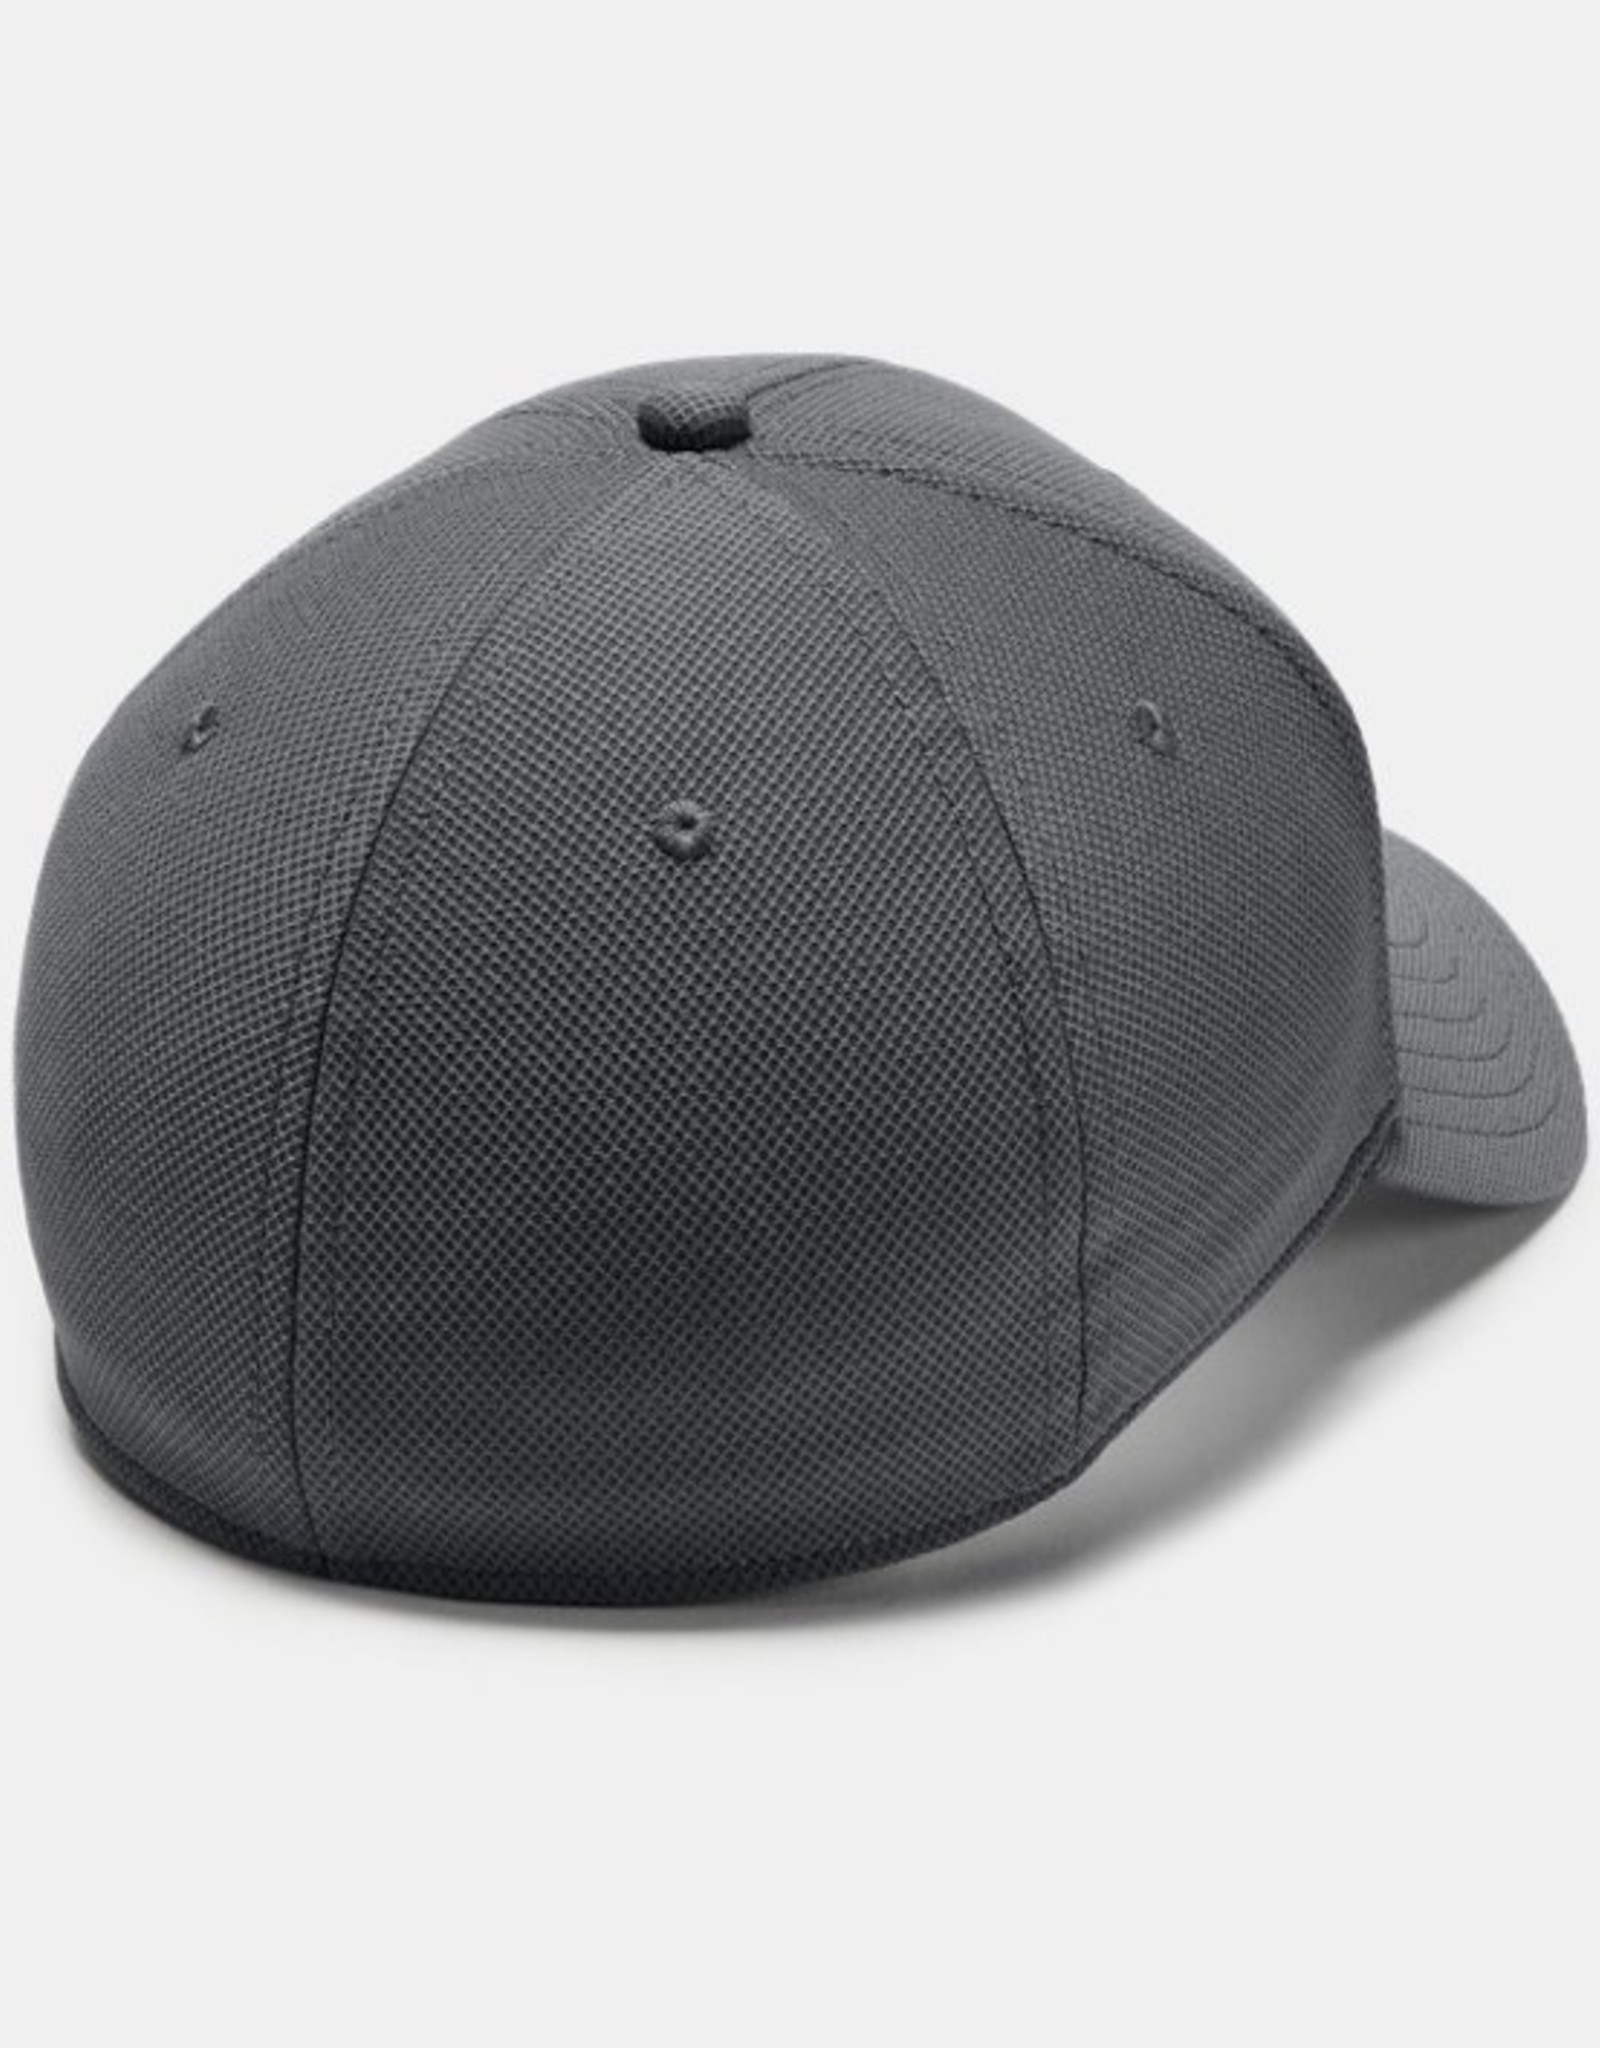 Under Armour MEN'S BLANK BLITZING CAP 1325823